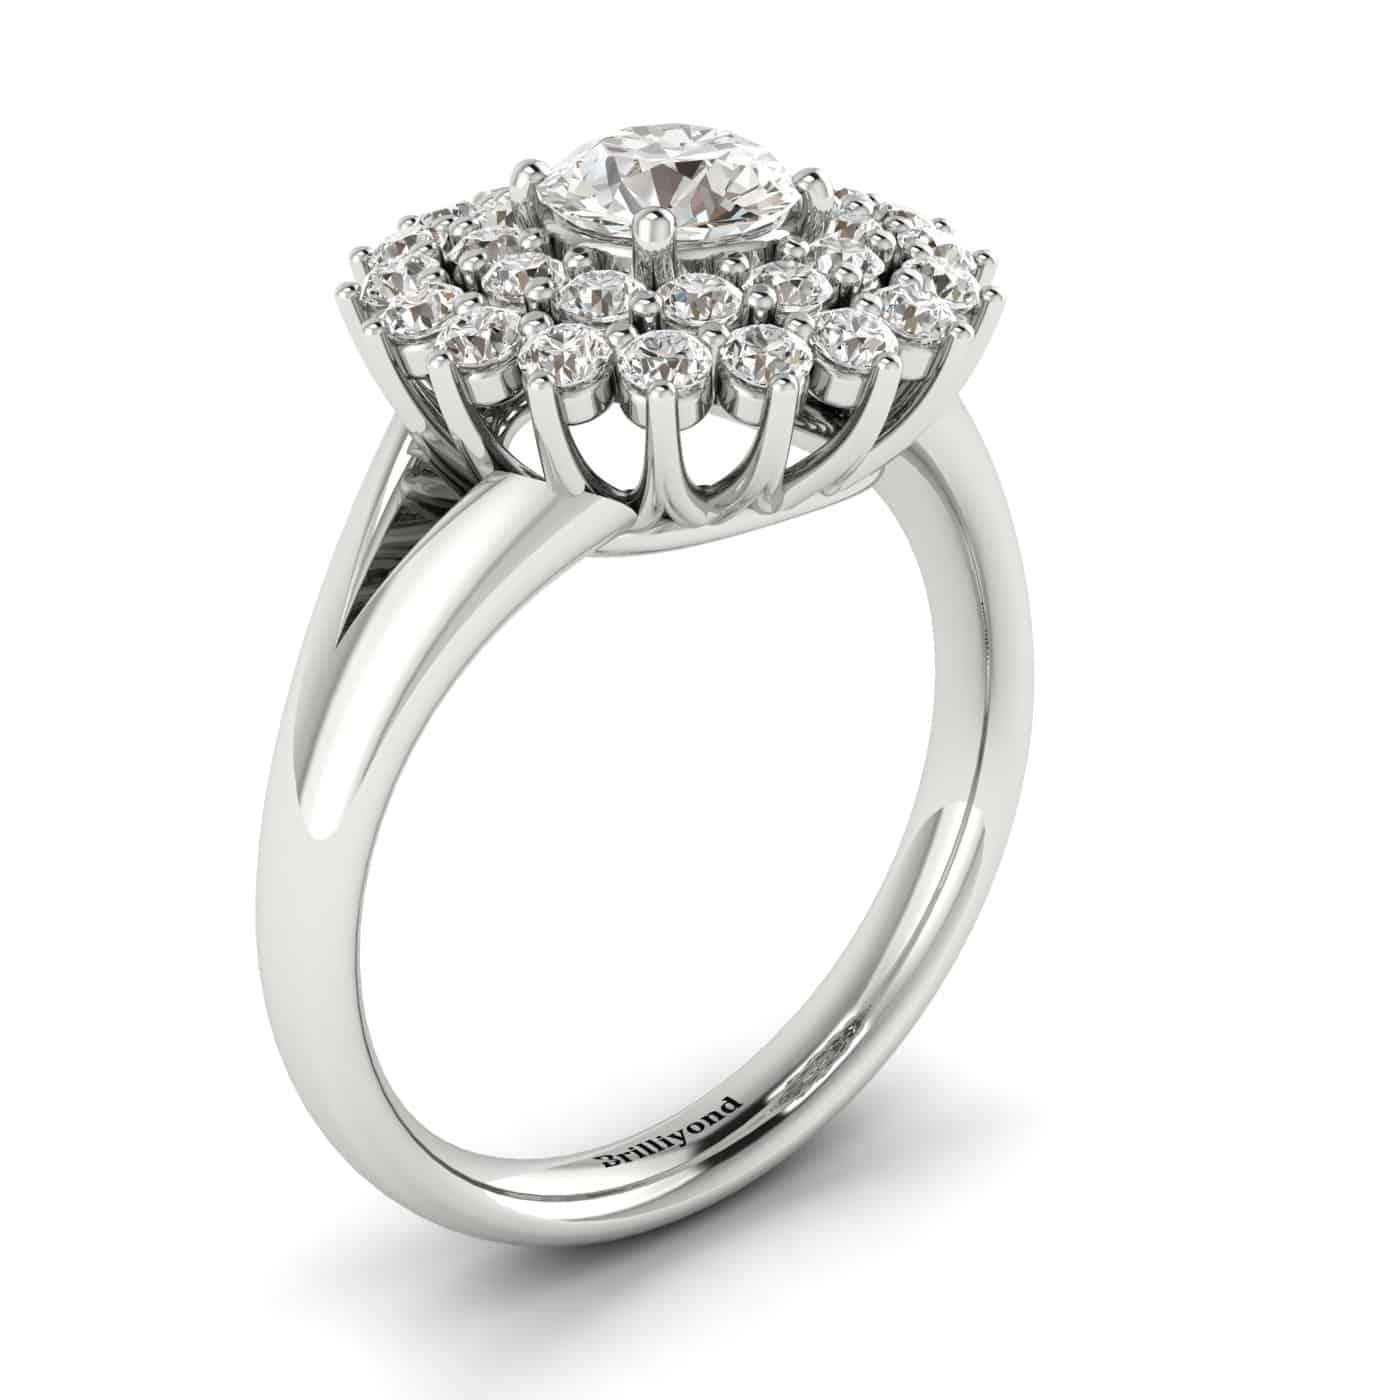 Diamond White Gold Cluster Engagement Ring Aquila_image1